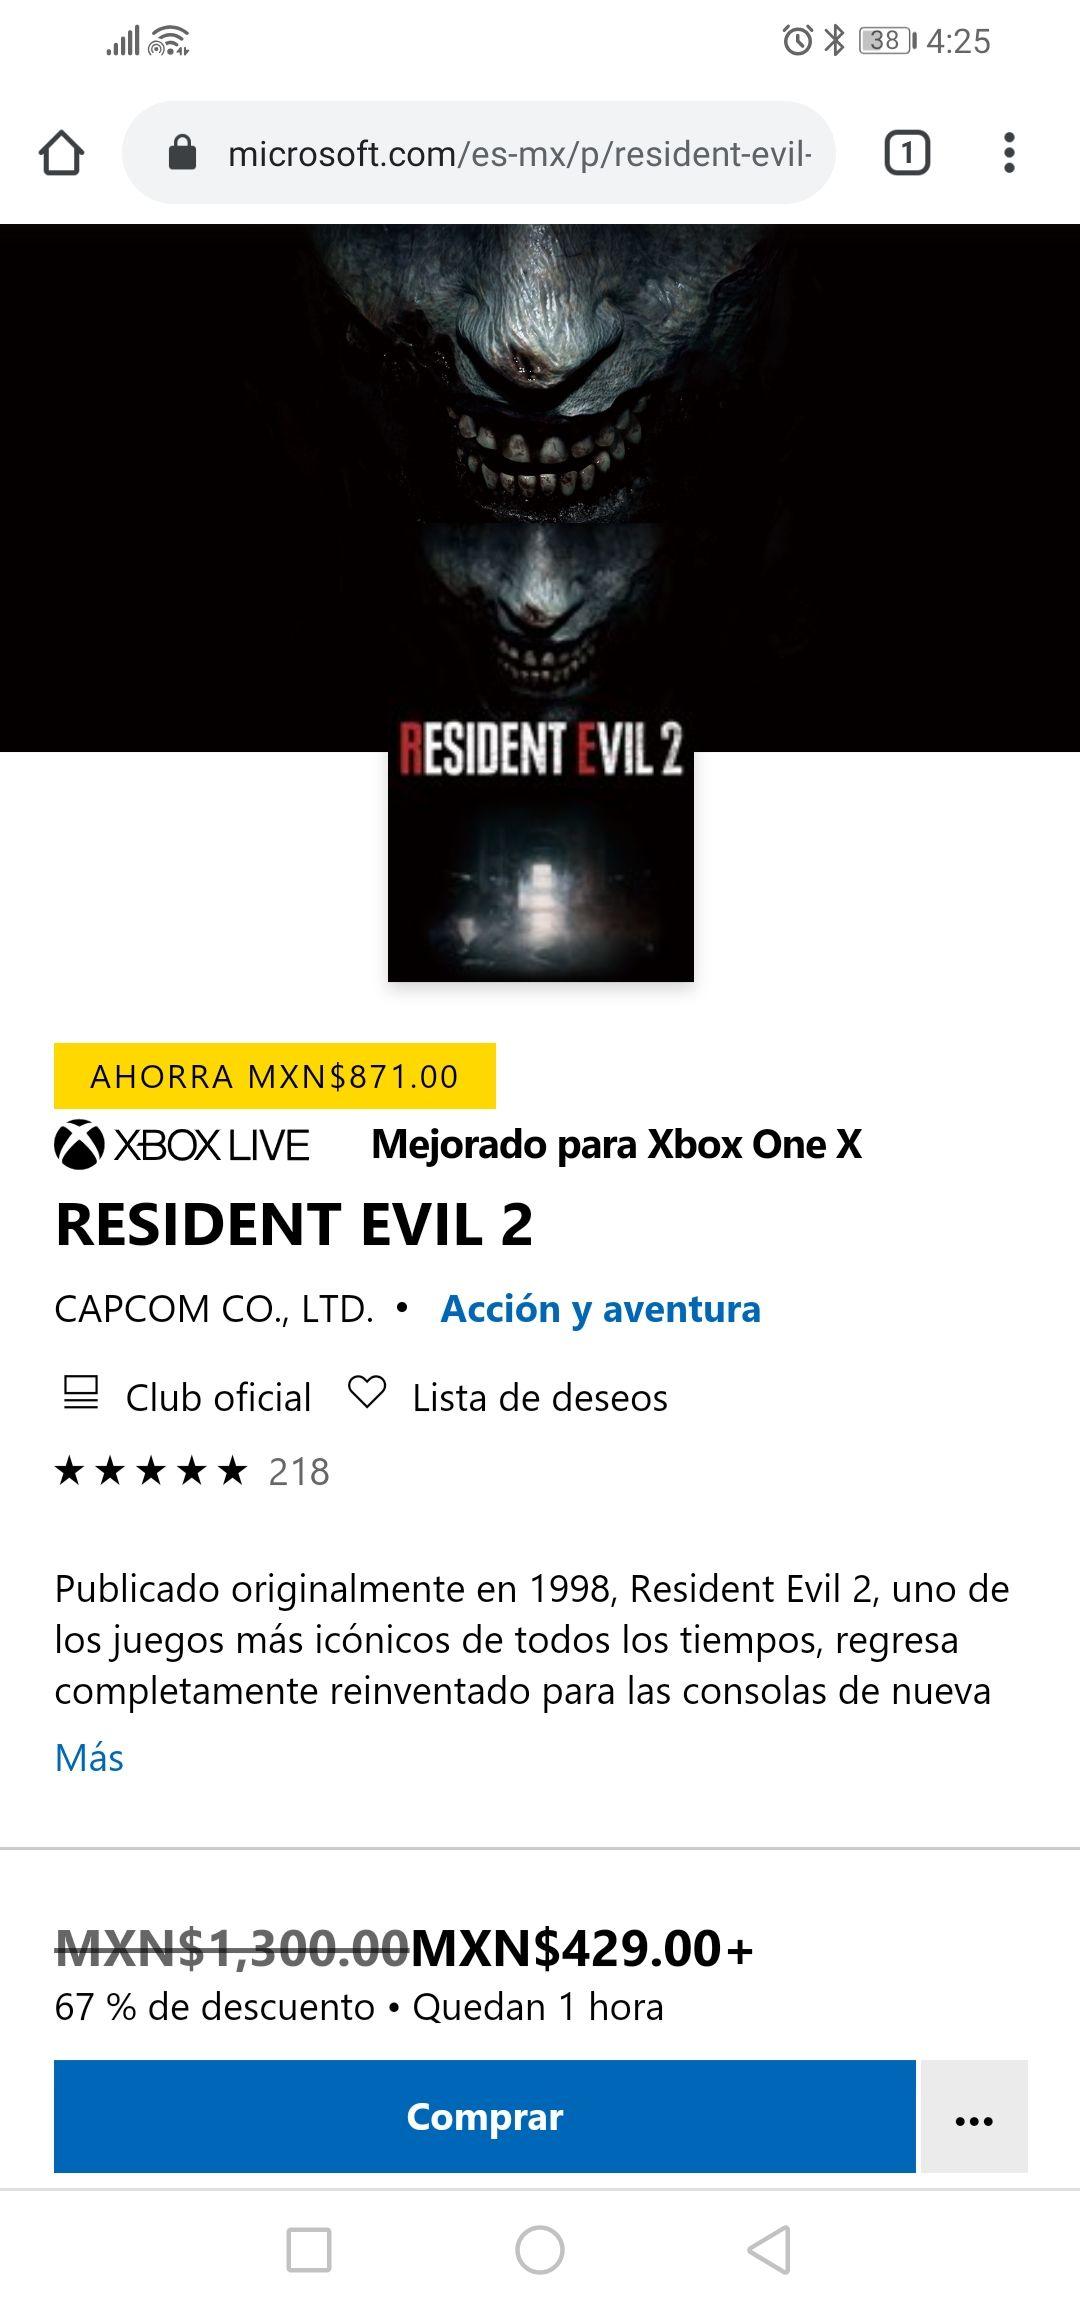 Microsoft Store: Resident Evil 2 standard edition digital